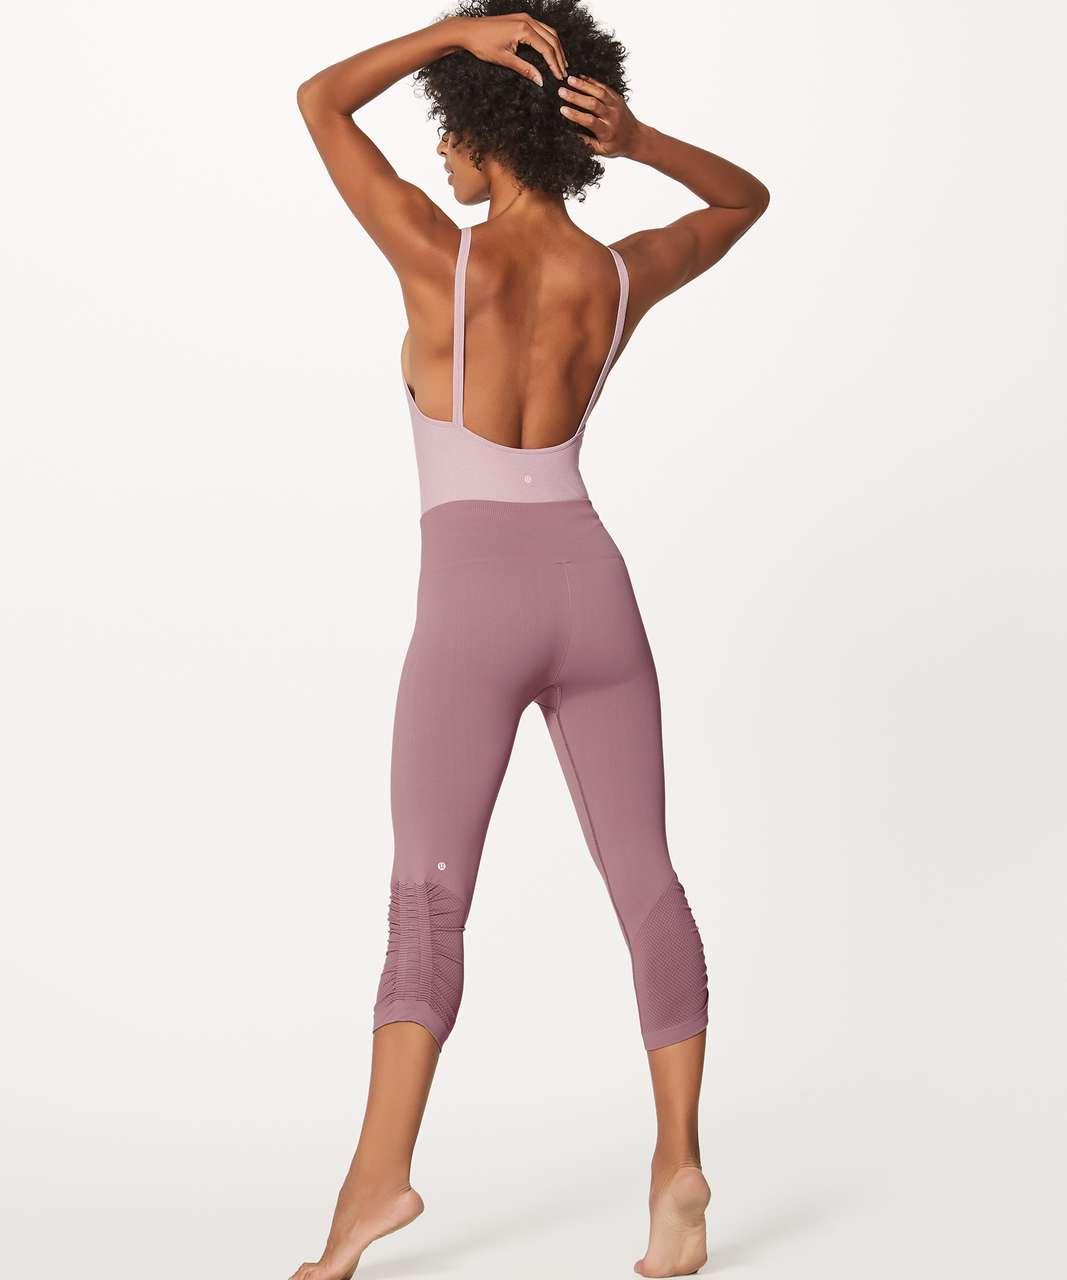 Lululemon Heart Opener Bodysuit (Taryn Toomey Collection) - Porcelain Pink